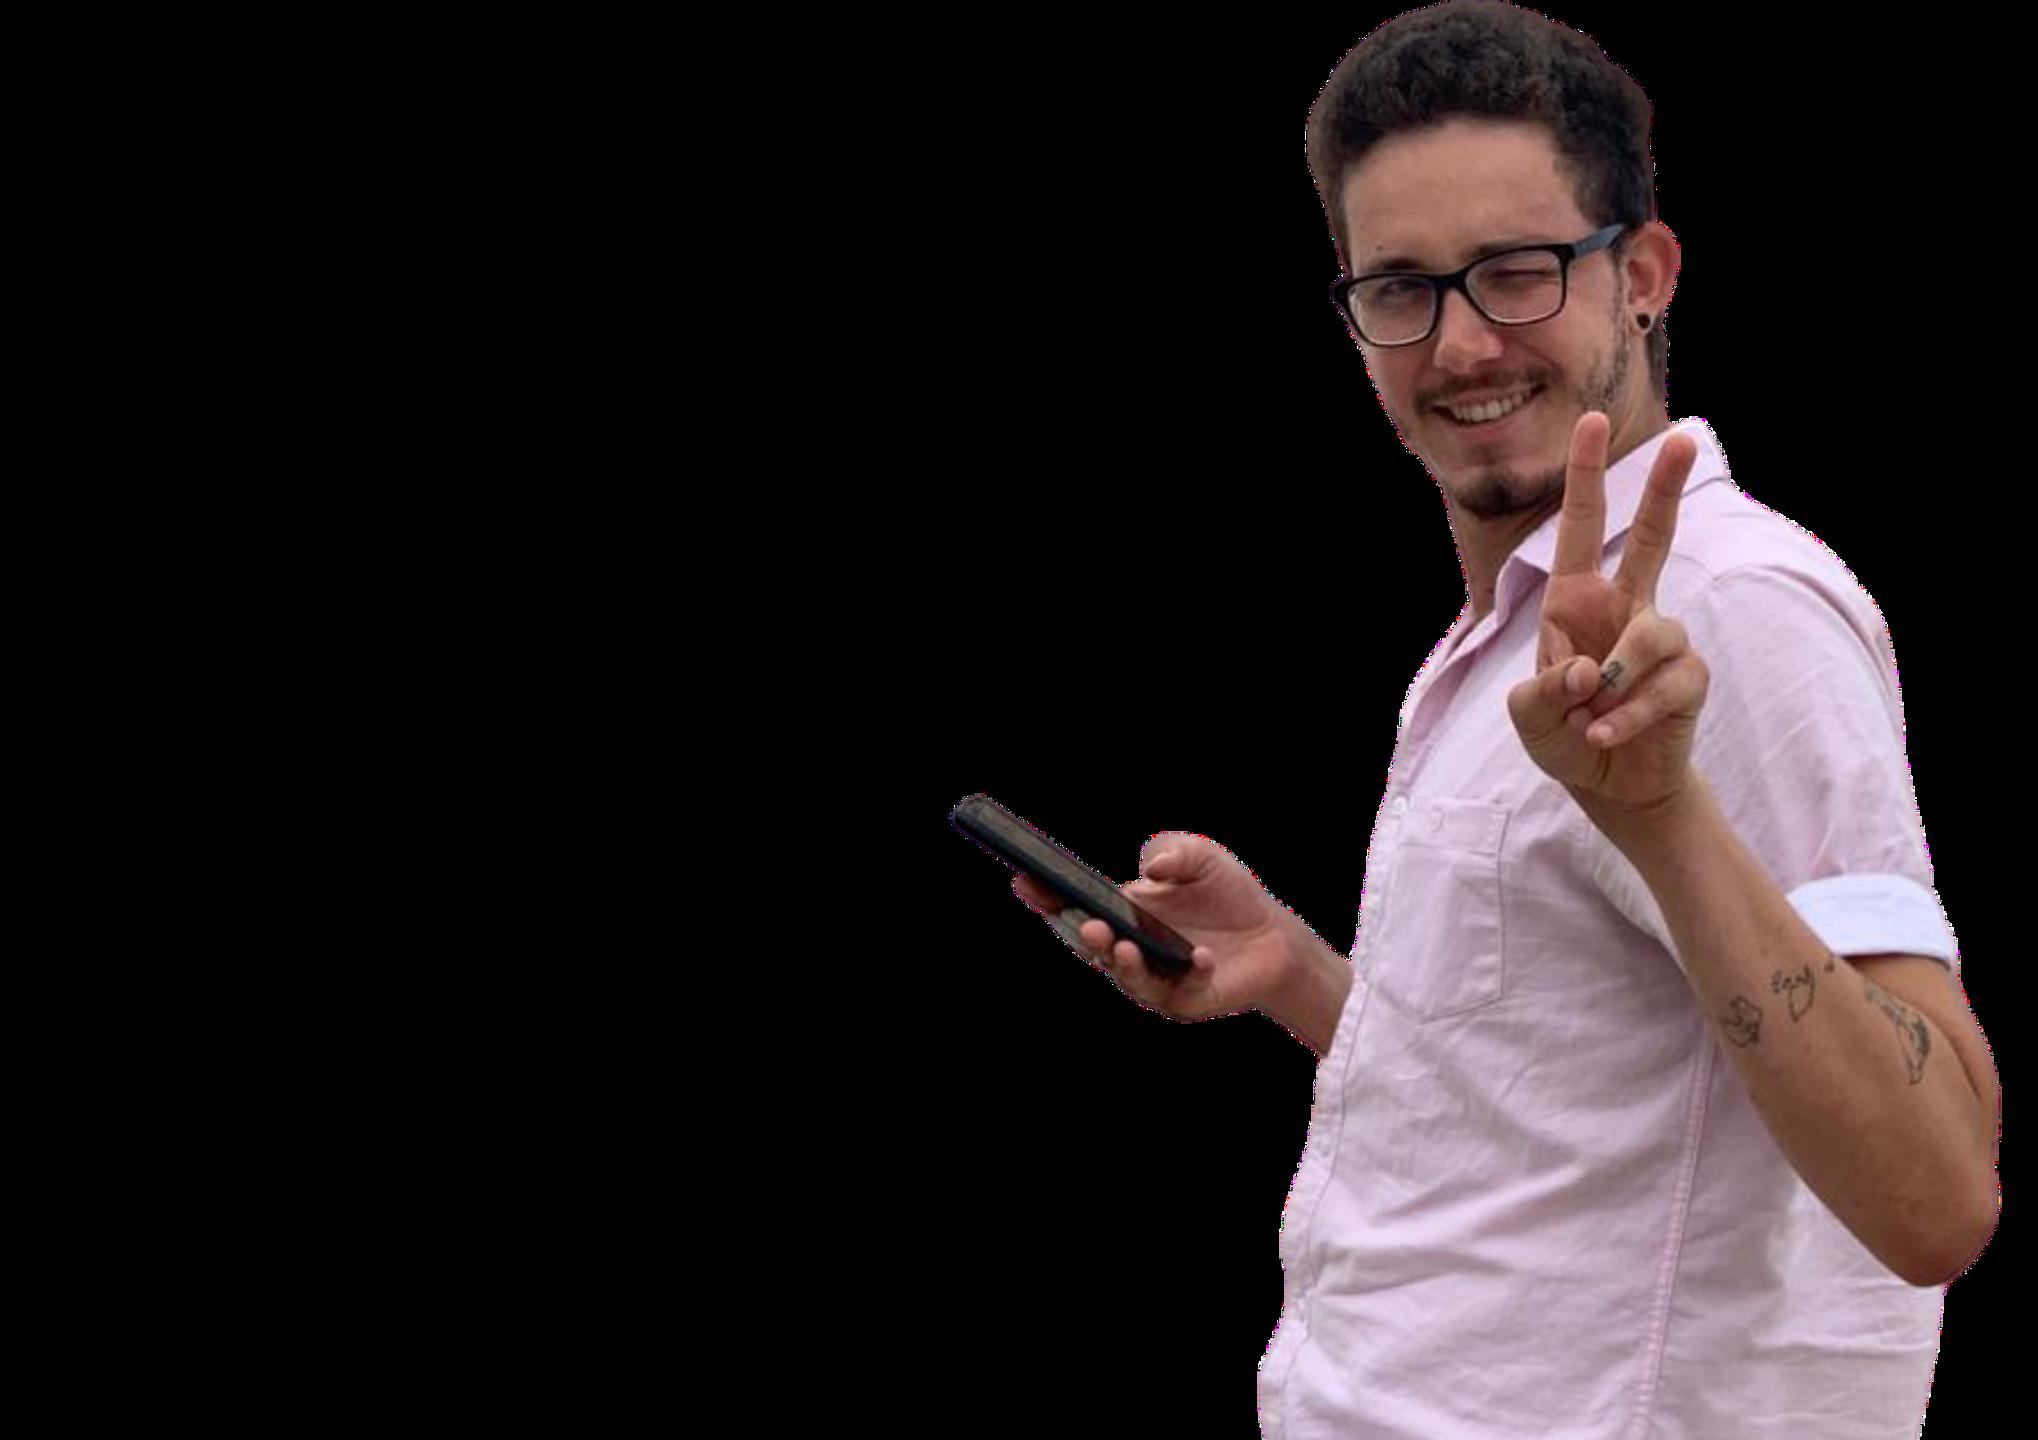 Pedro dell'Isola holding smartphone